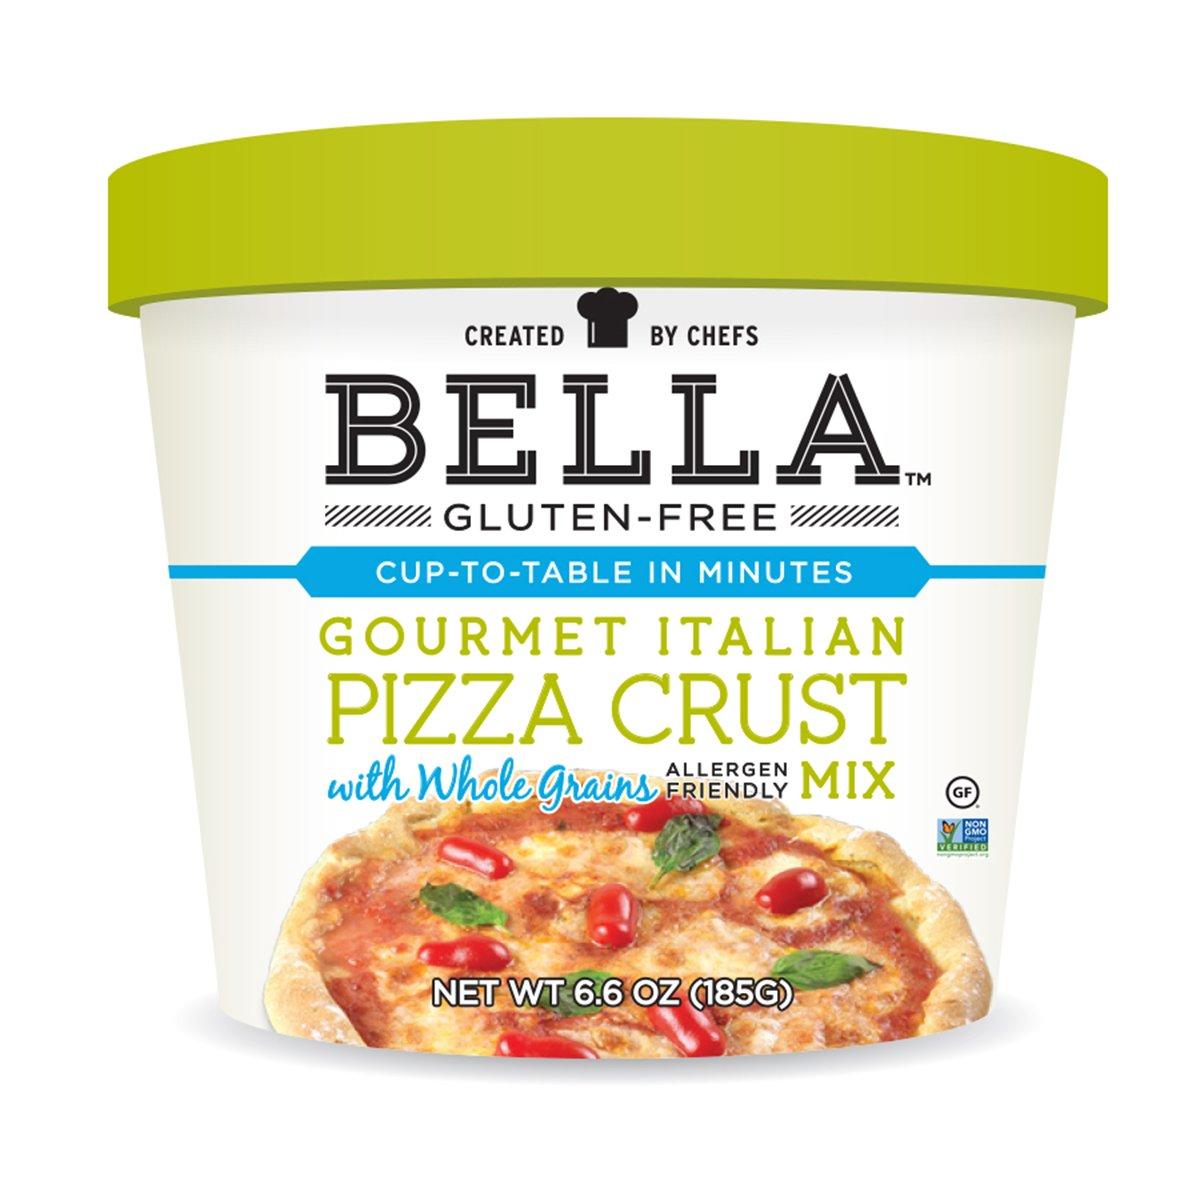 Bella Gluten-Free Italian Pizza Crust Dough Mix Premium Casein Free Healthy Flour, 6.6 oz (6 Pack) by Bella Gluten Free